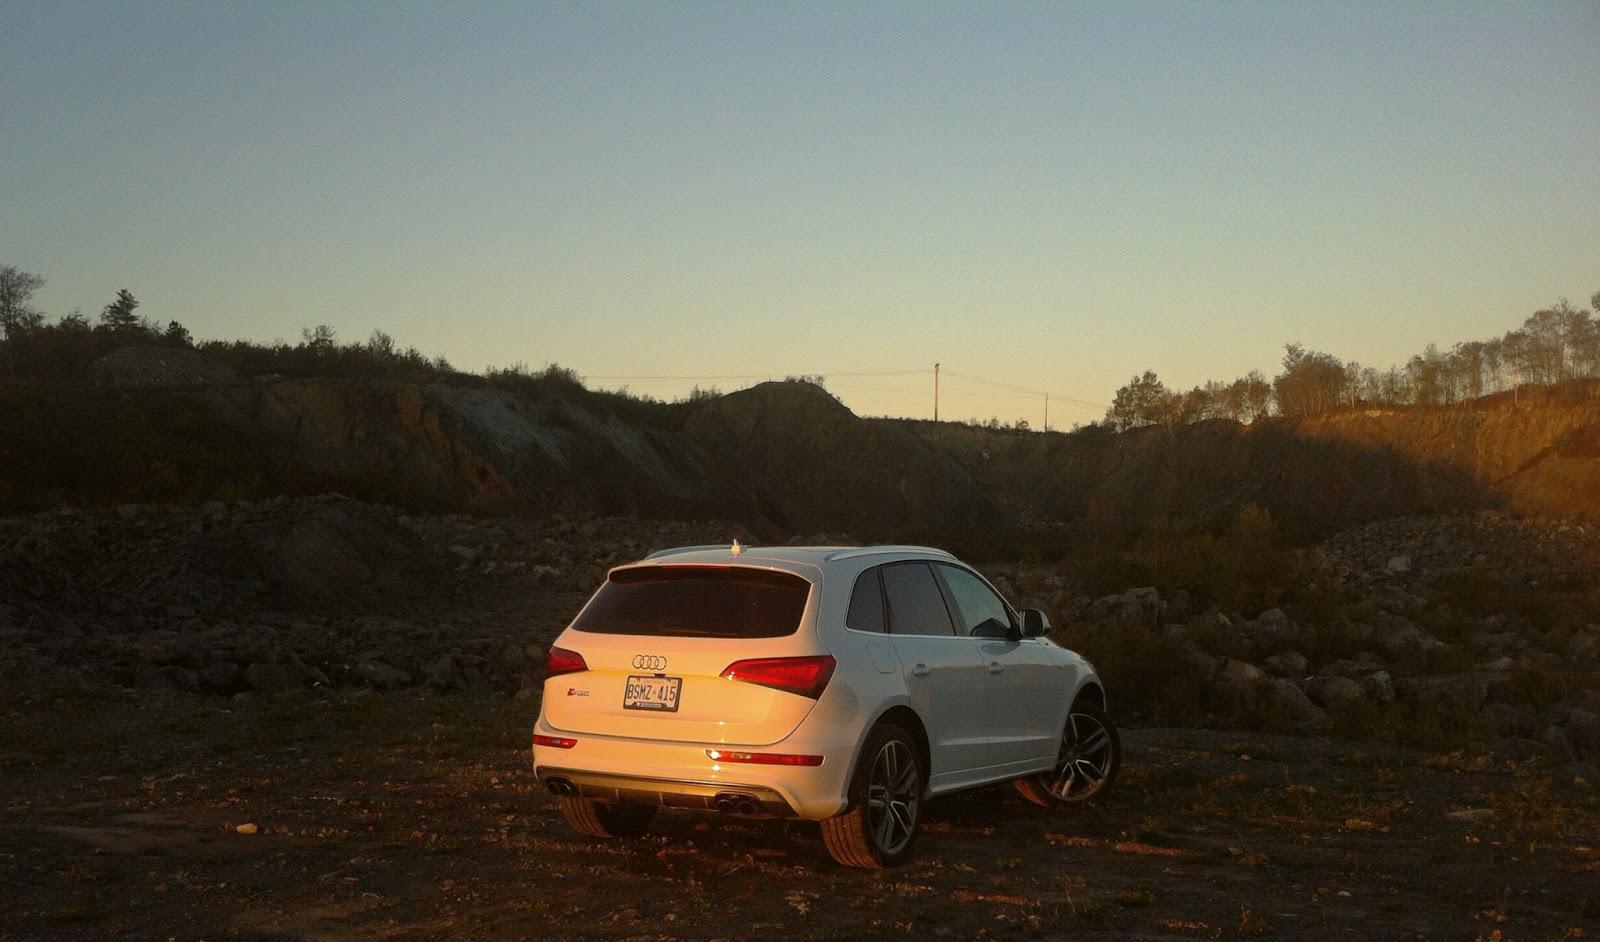 2014 Audi SQ5 rear view